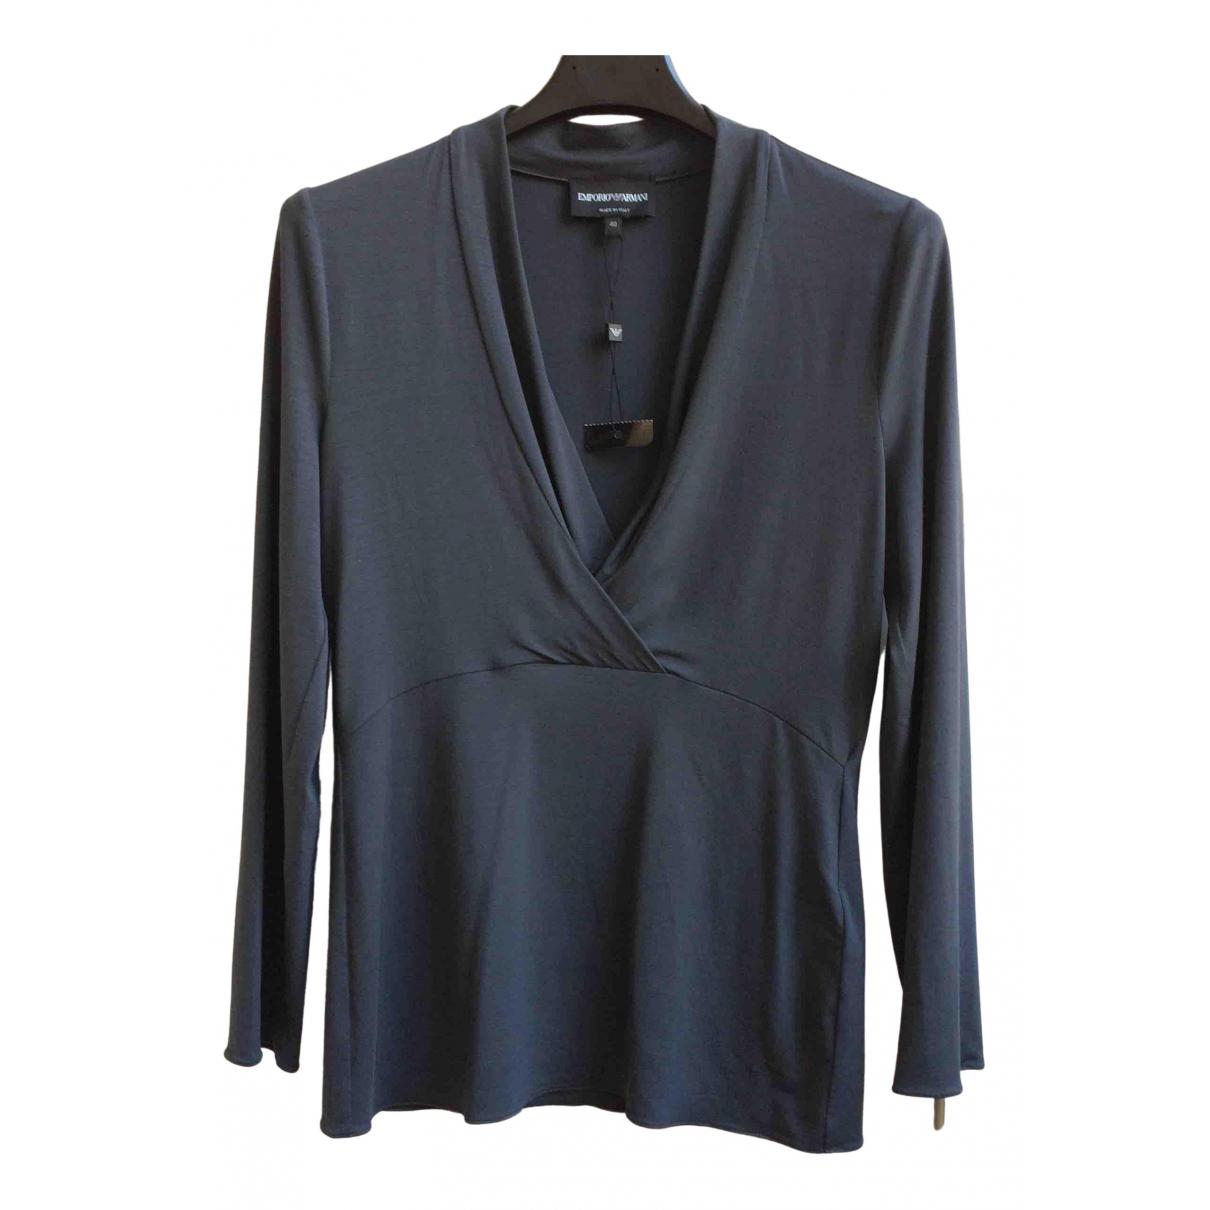 Emporio Armani \N Grey  top for Women 40 IT